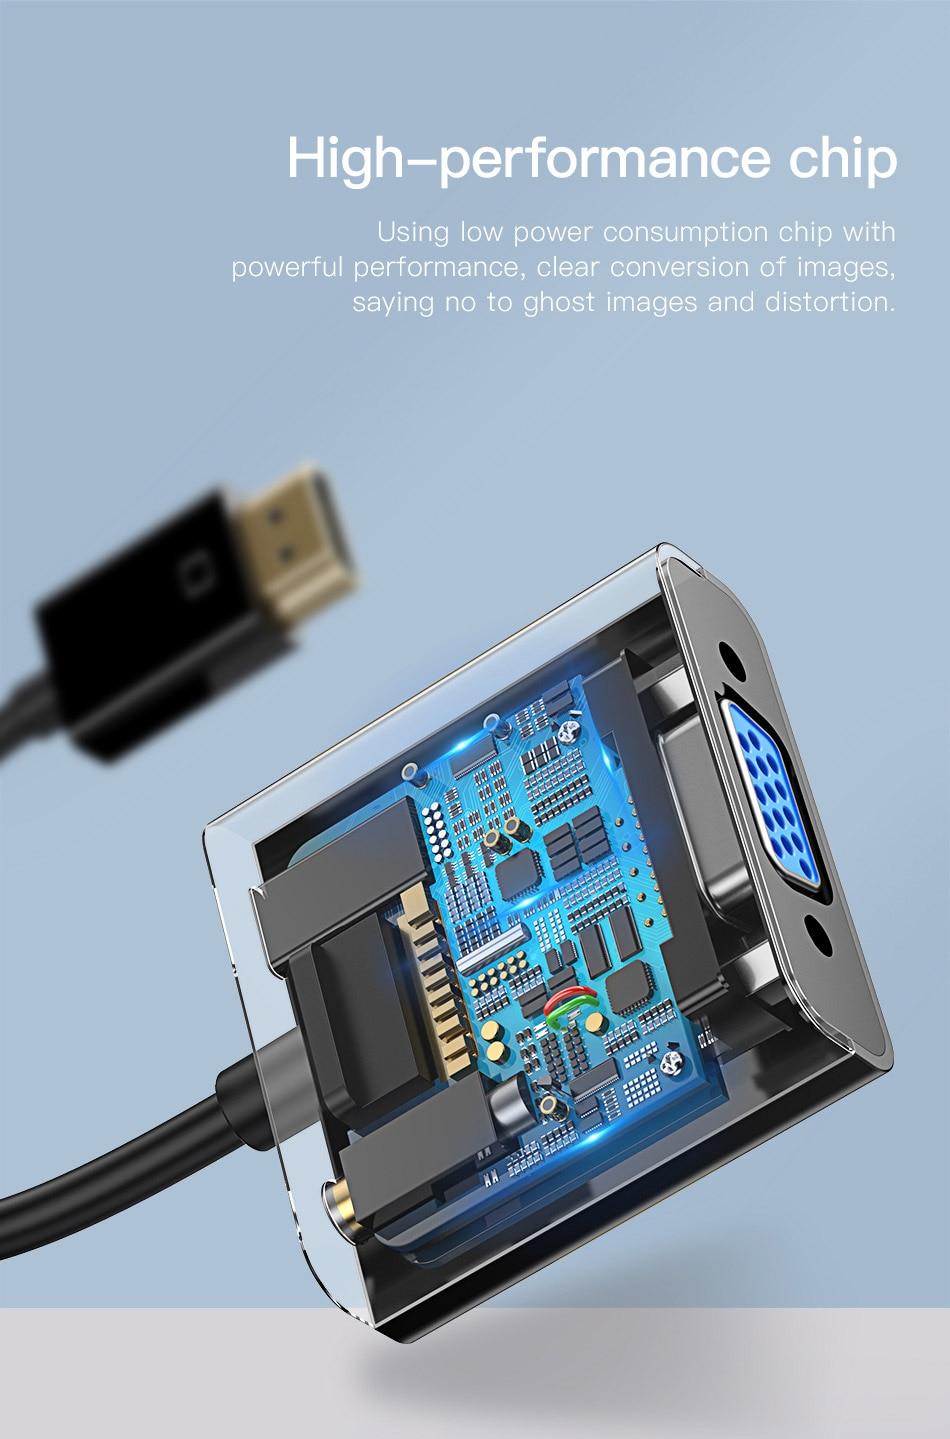 HTB1H3SsmOAnBKNjSZFvq6yTKXXaQ Baseus HDMI to VGA Cable HDMI VGA Adapter Digital HDMI to VGA Jack 3.5 mm Converter Video Aux Audio Splitter For Laptop PS4 TV